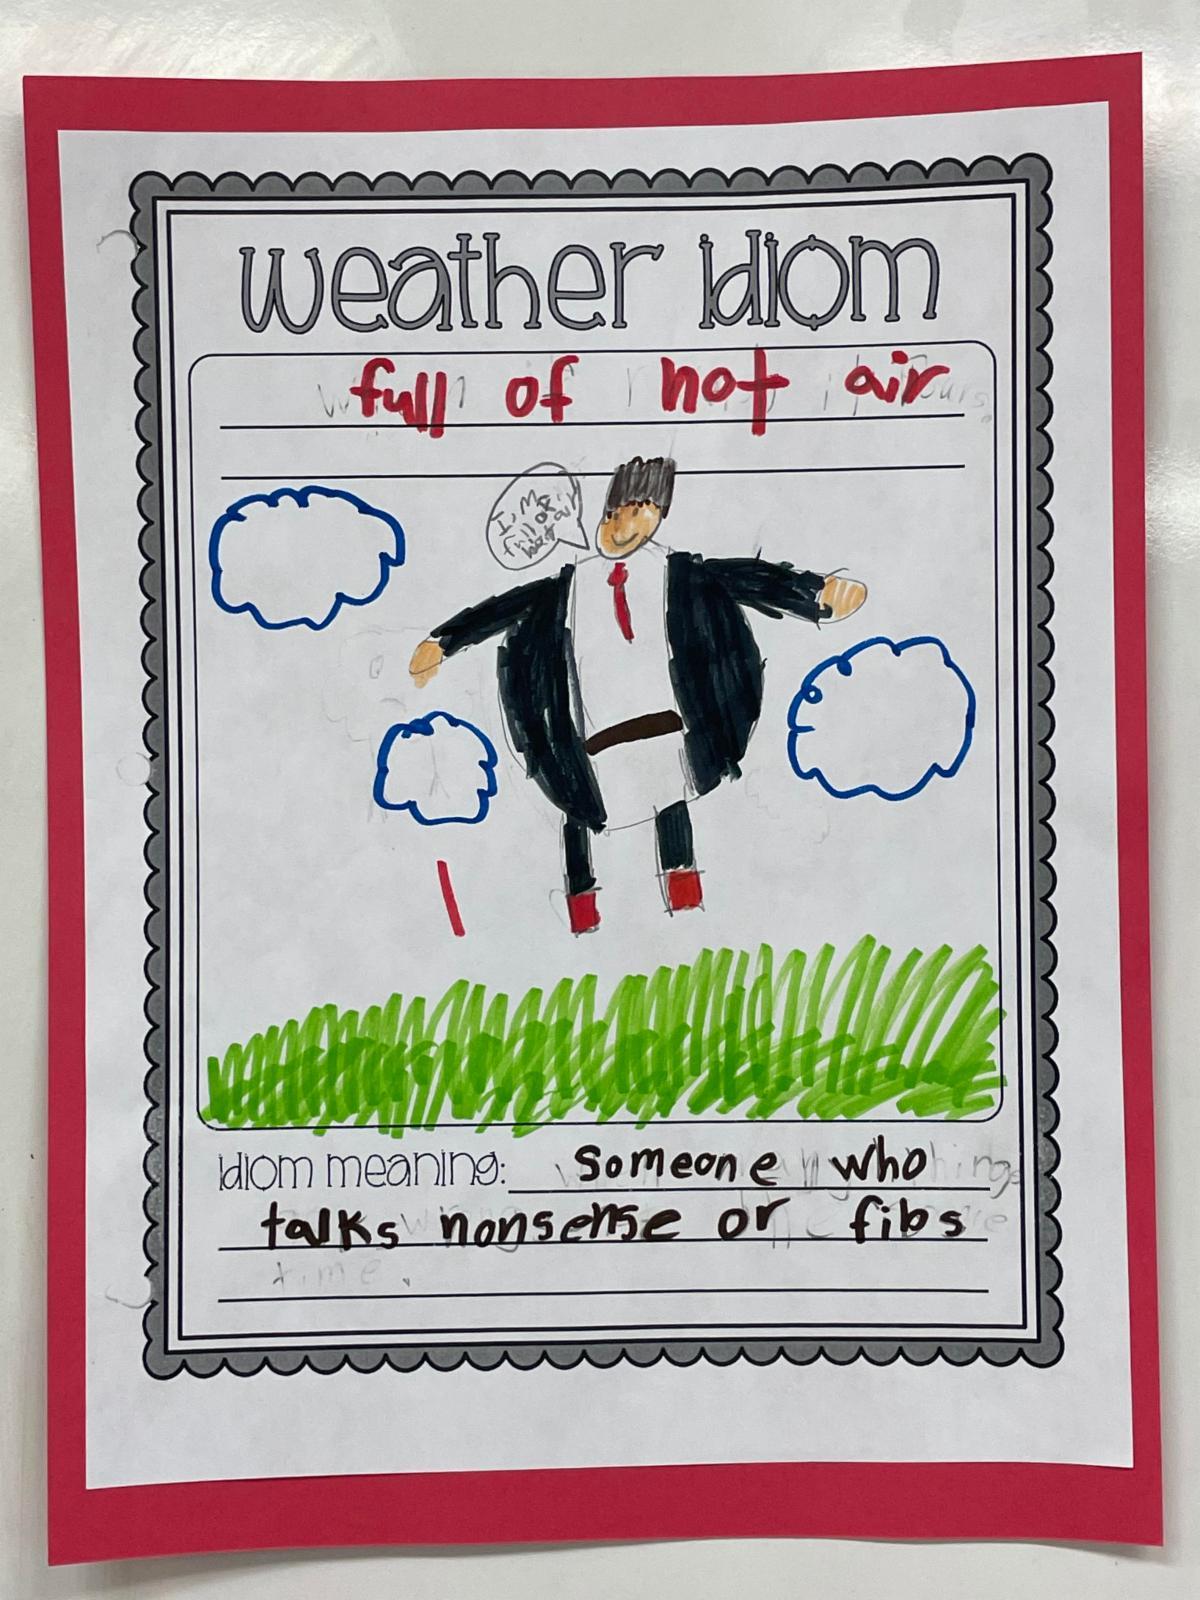 4th grade idiom Full of Hot Air